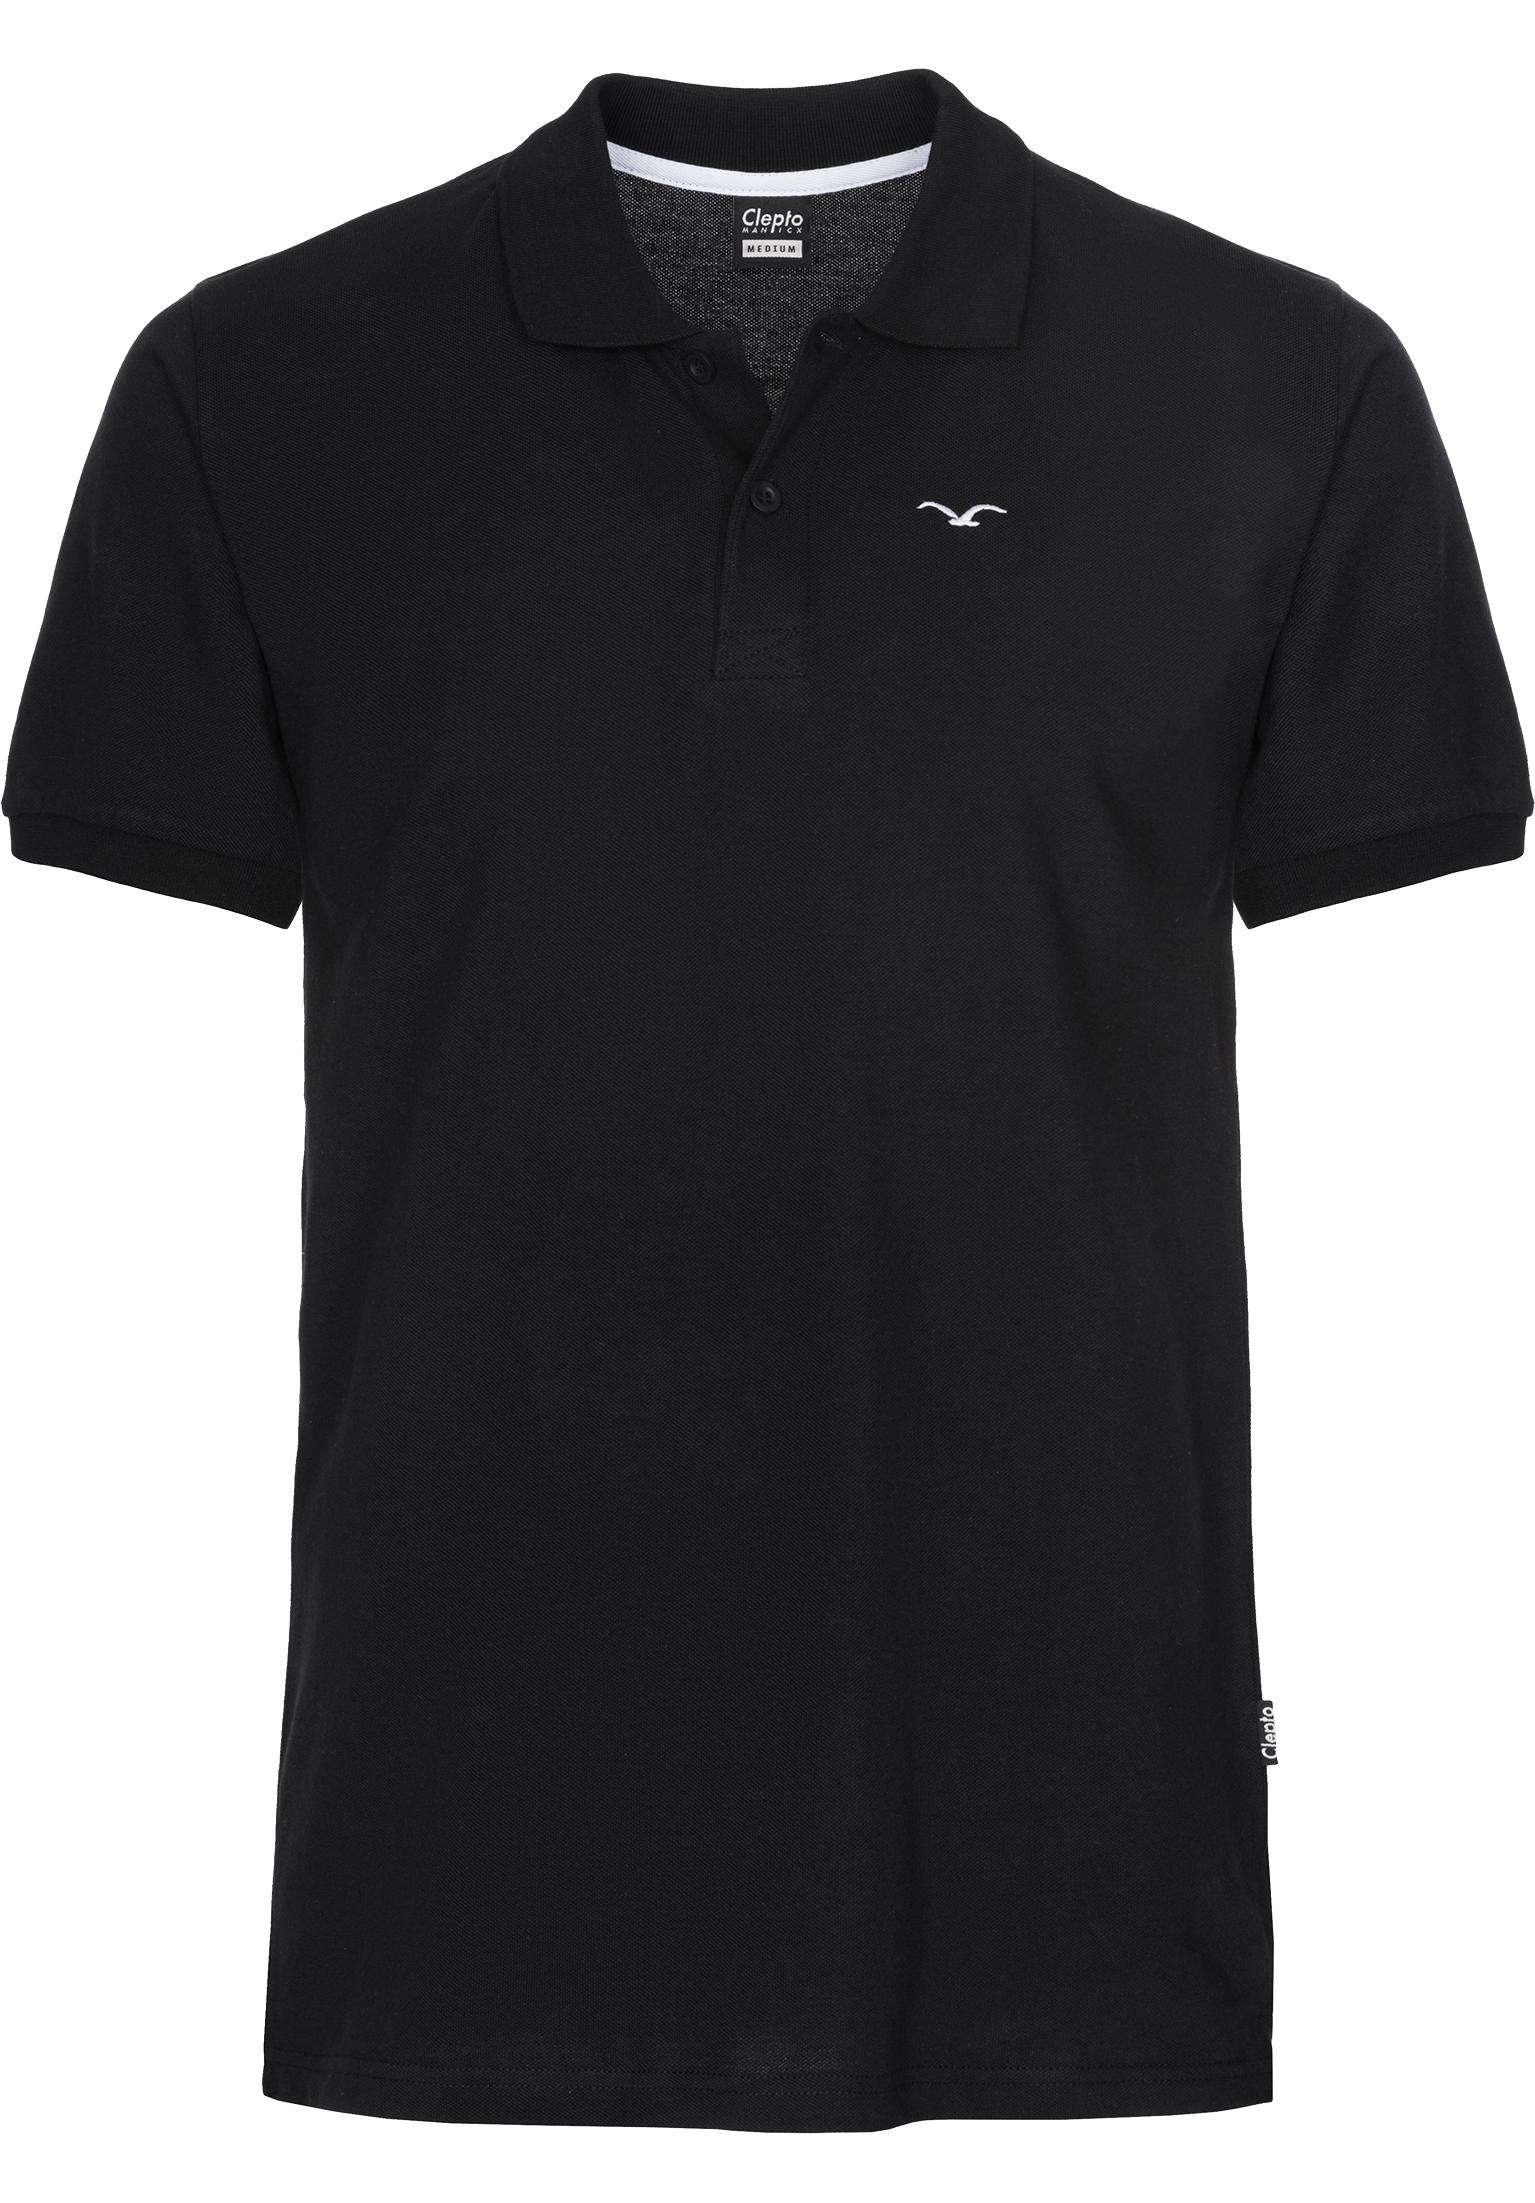 Polo Mowe Cleptomanicx Polo Shirts In Black Fur Herren Titus